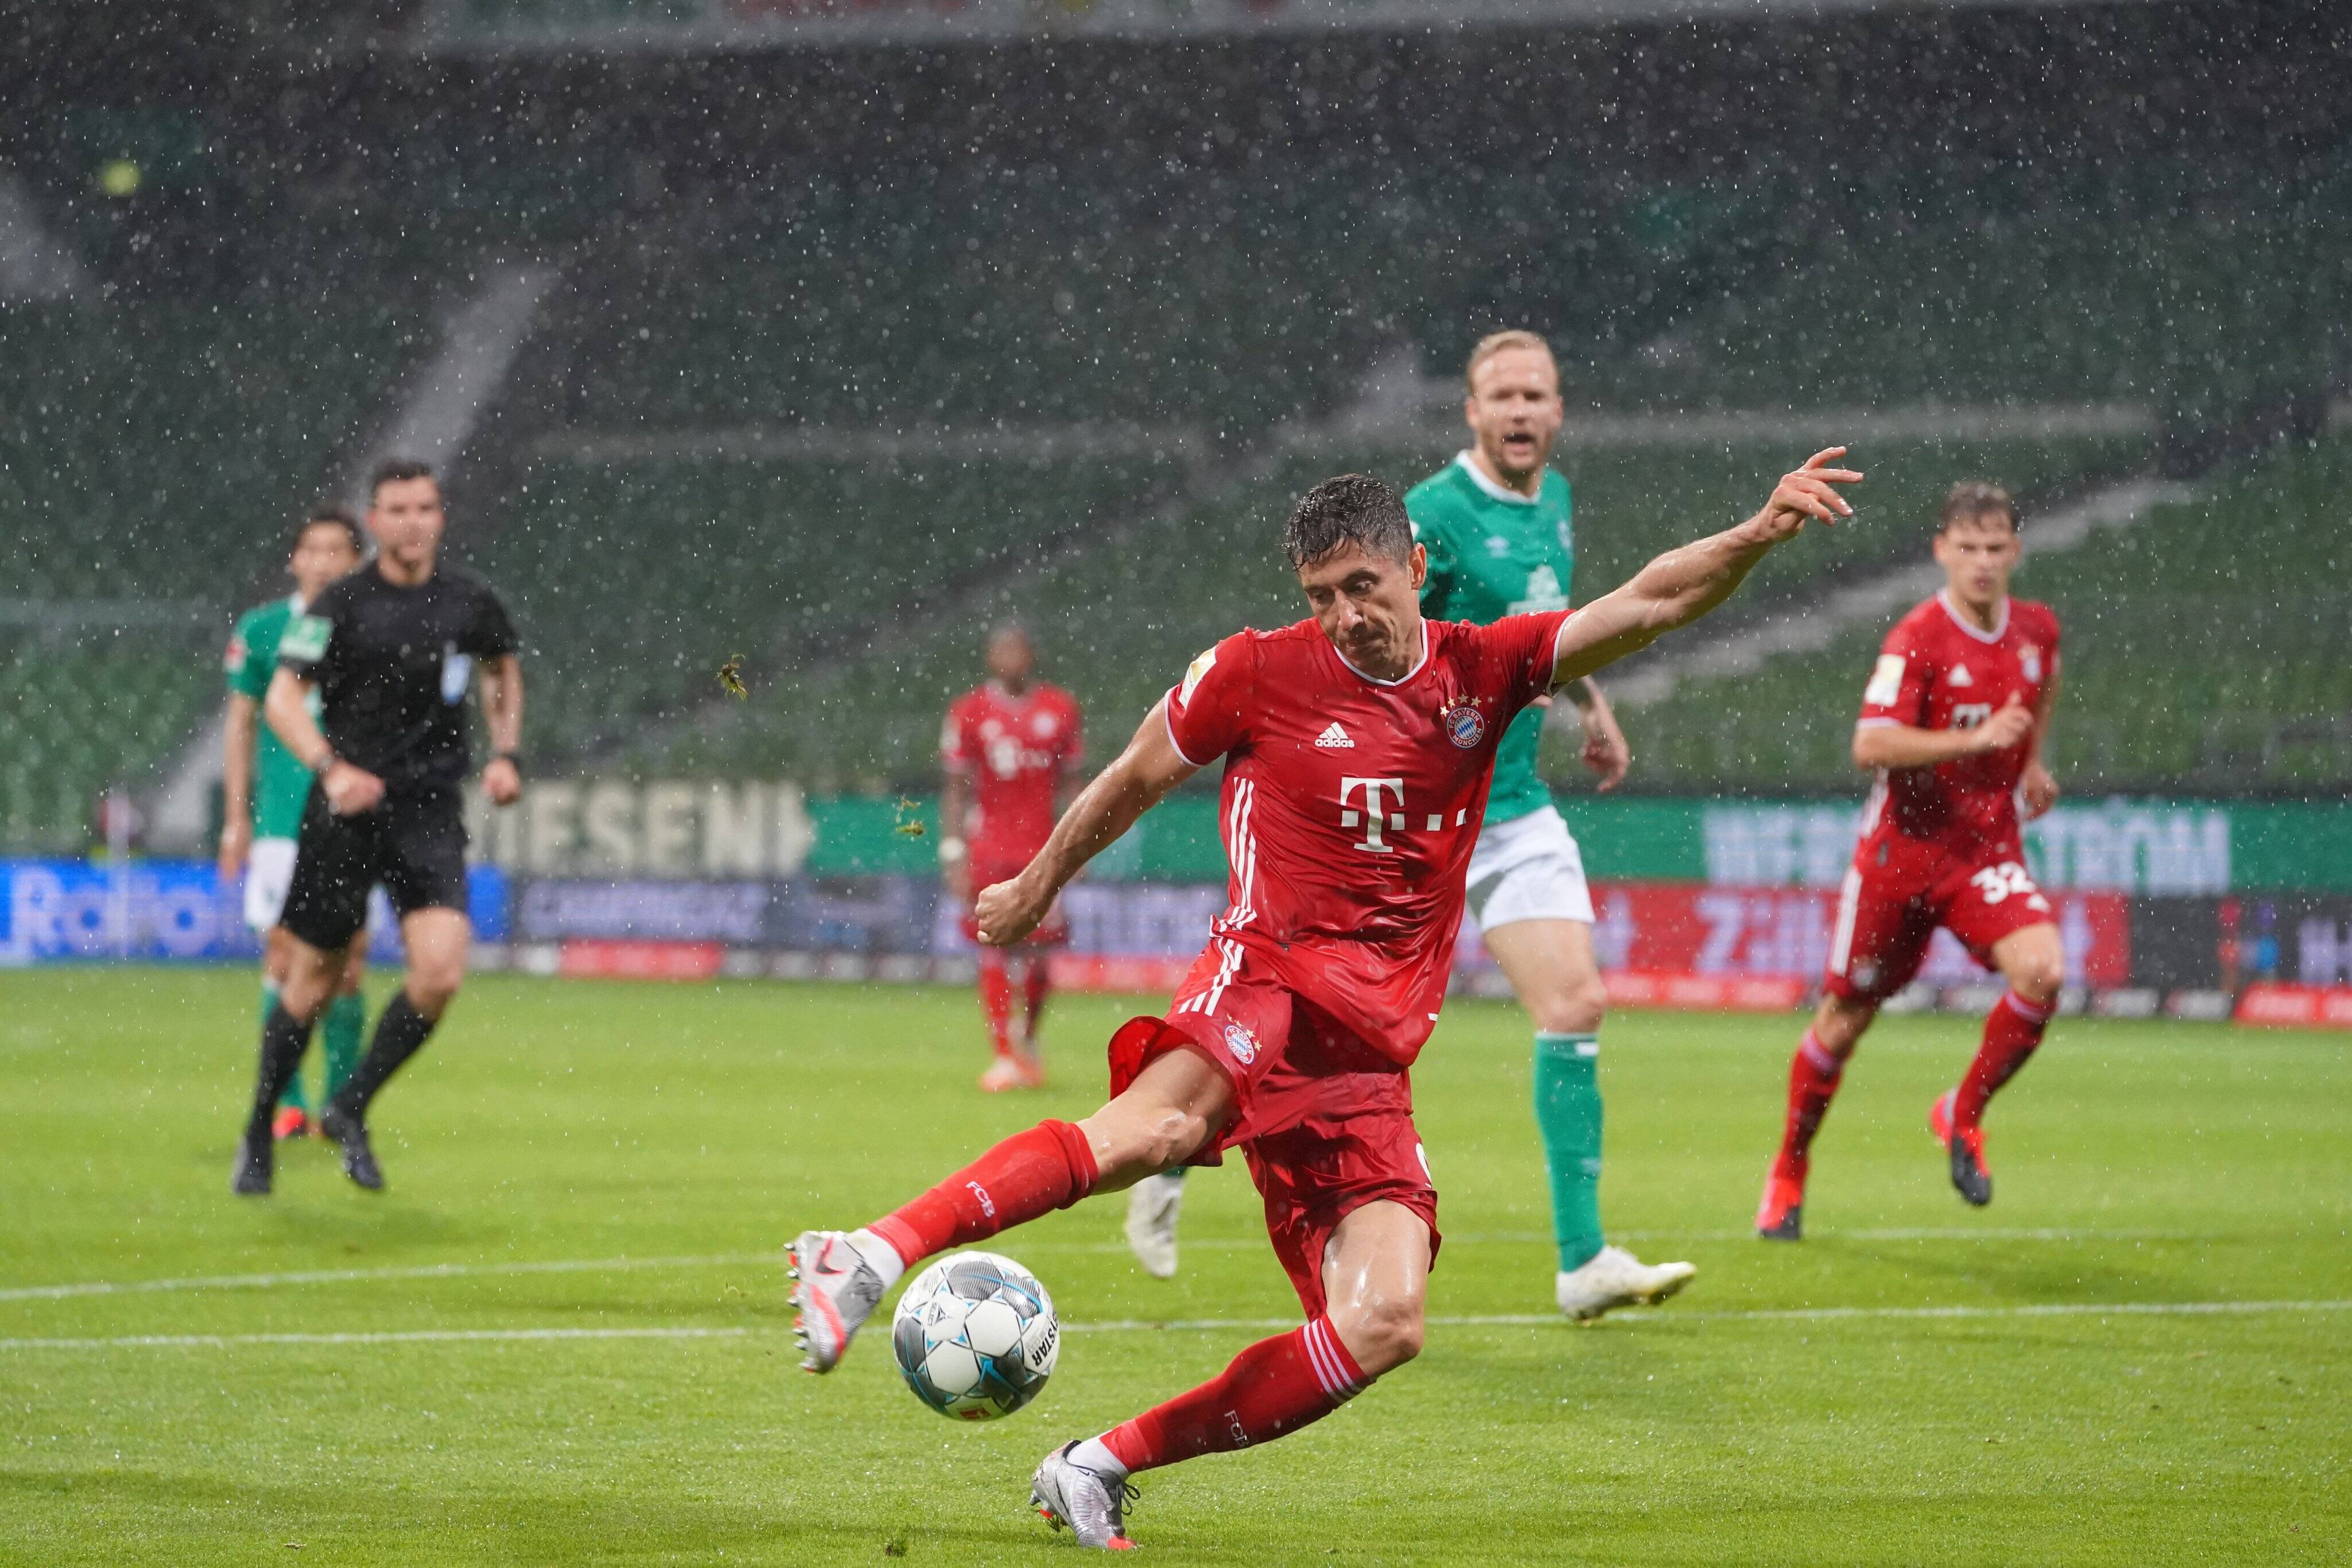 Foto: Reprodução/Twitter Bayern